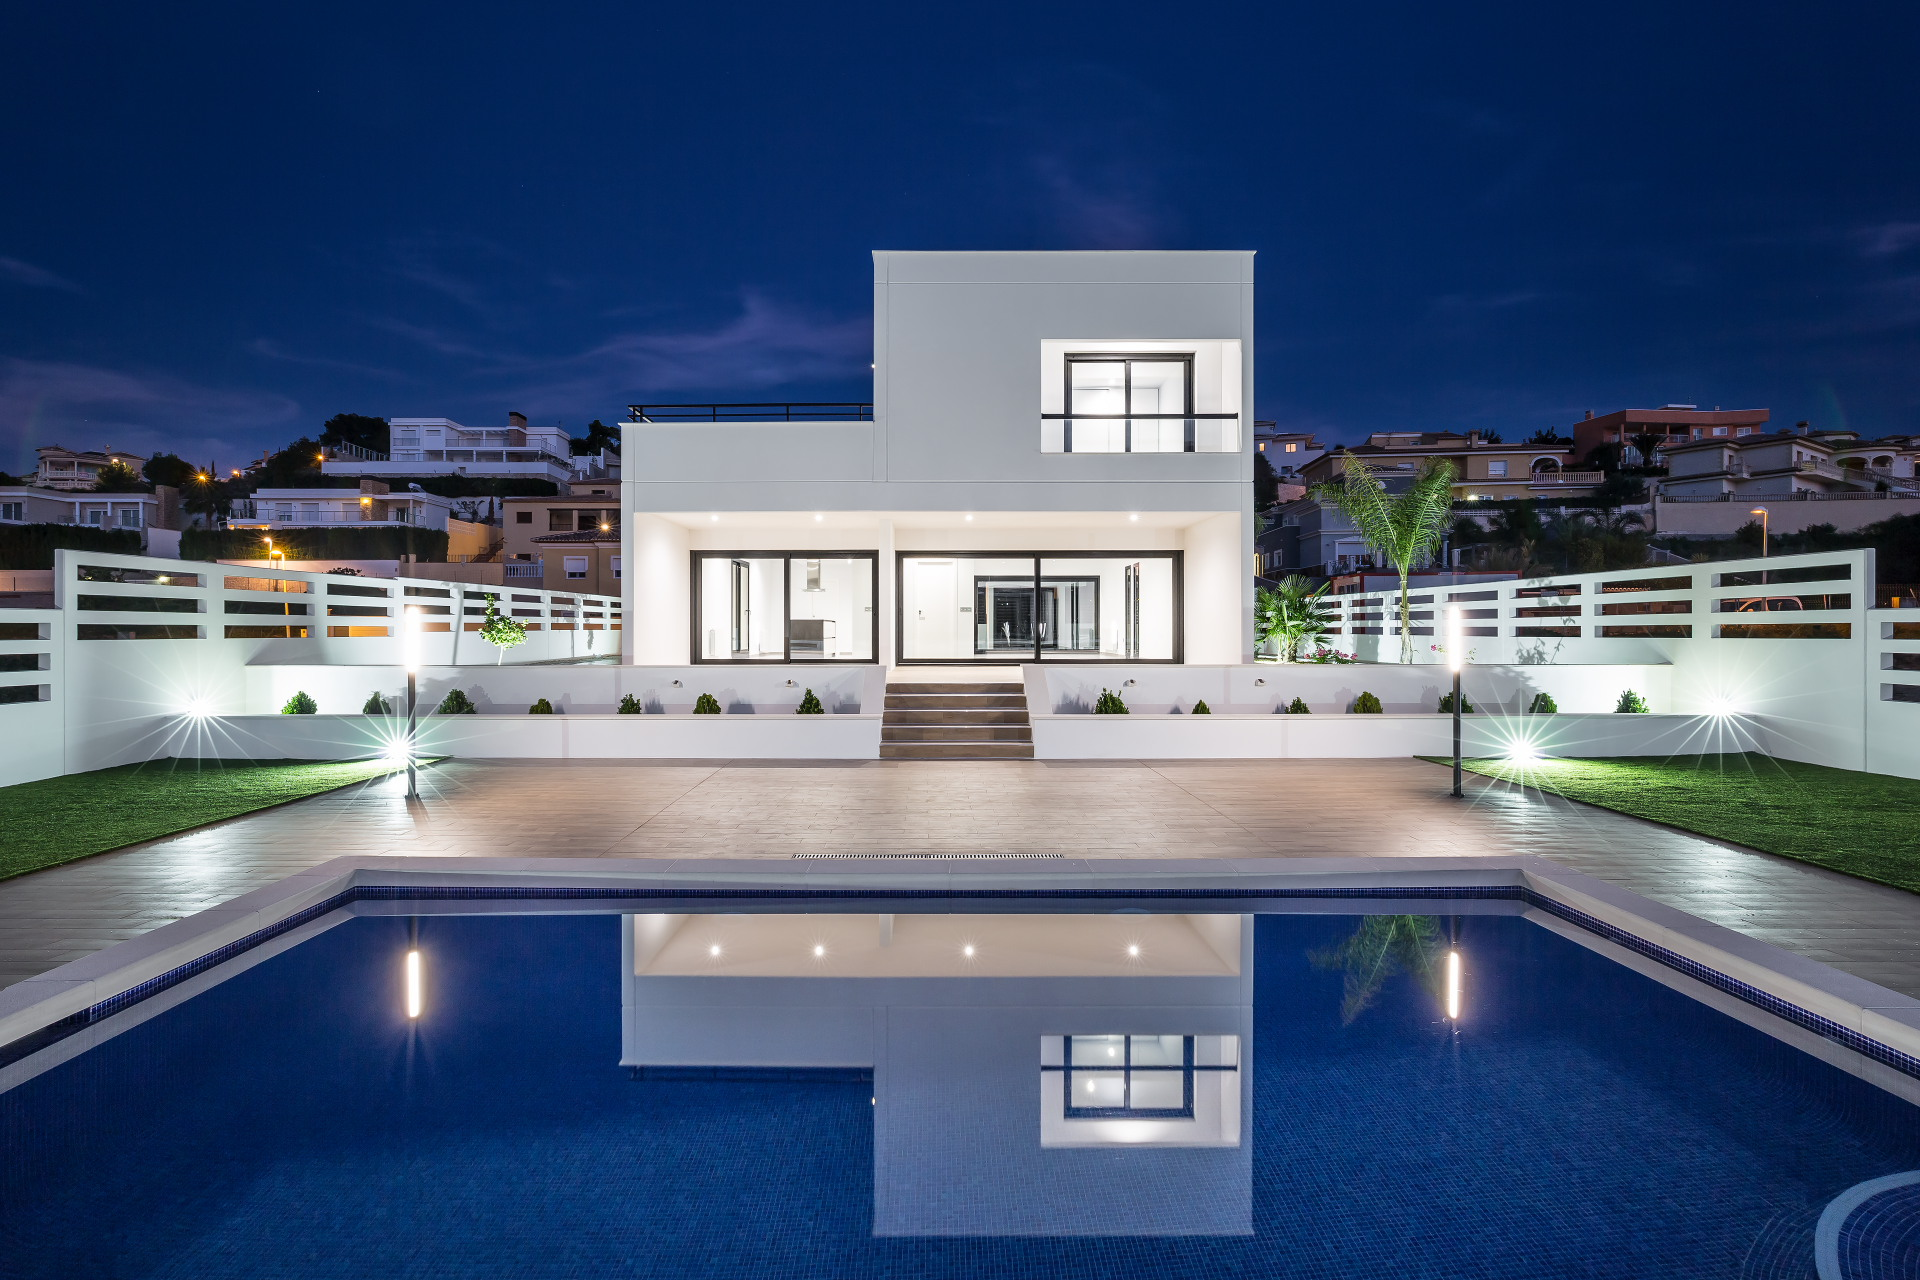 fotografia-arquitectura-valencia-german-cabo-viraje-vivienda-unifamiliar-calpe (52)